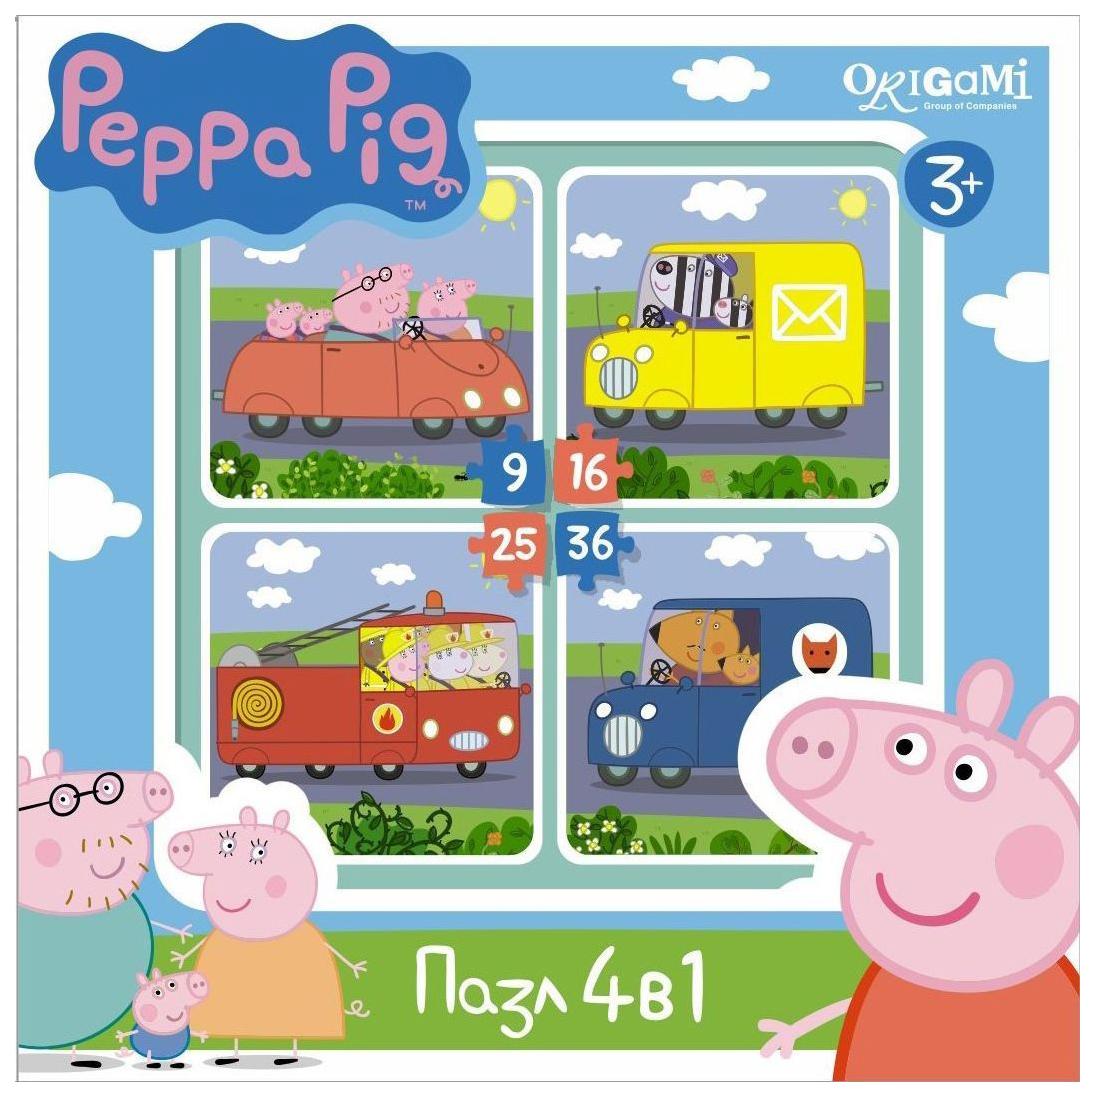 Купить Пазл Оригами 4 в 1 Peppa Pig. Транспорт арт. 01597 1597, Пазлы